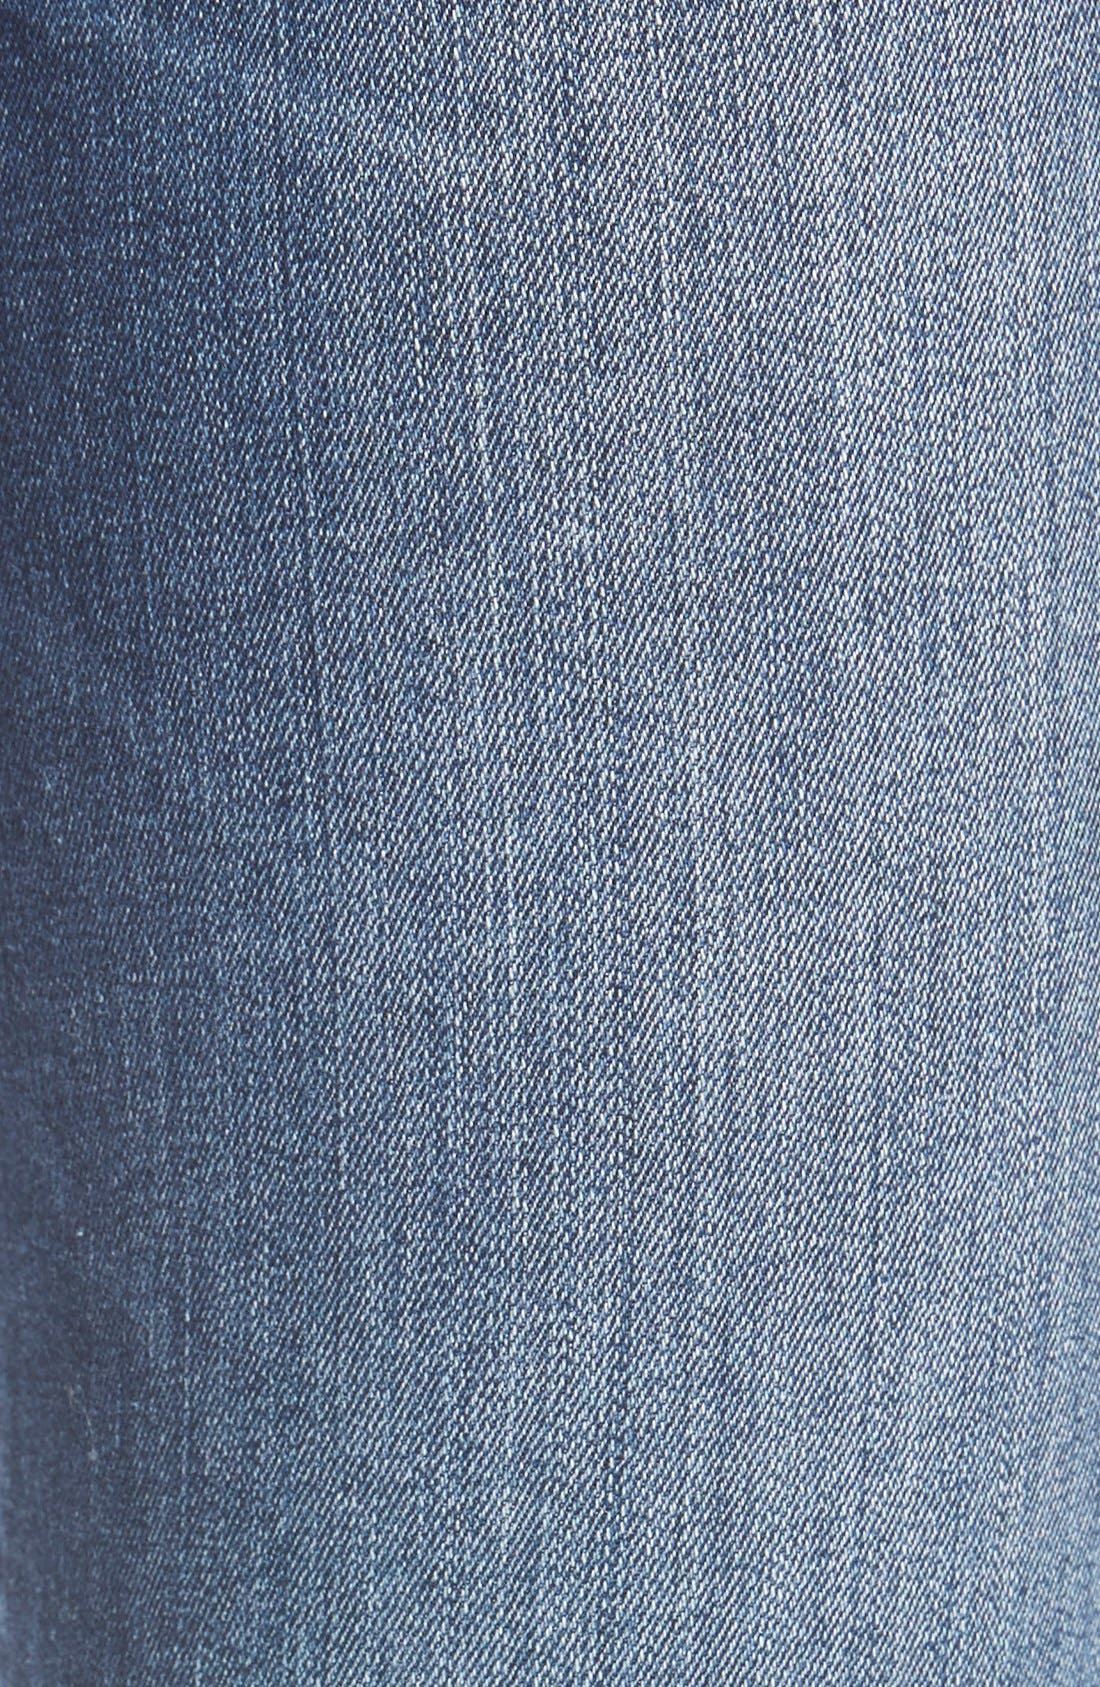 Alternate Image 5  - Mavi Jeans 'Serena' Stretch Low Rise Skinny Jeans (Indigo Nolita)